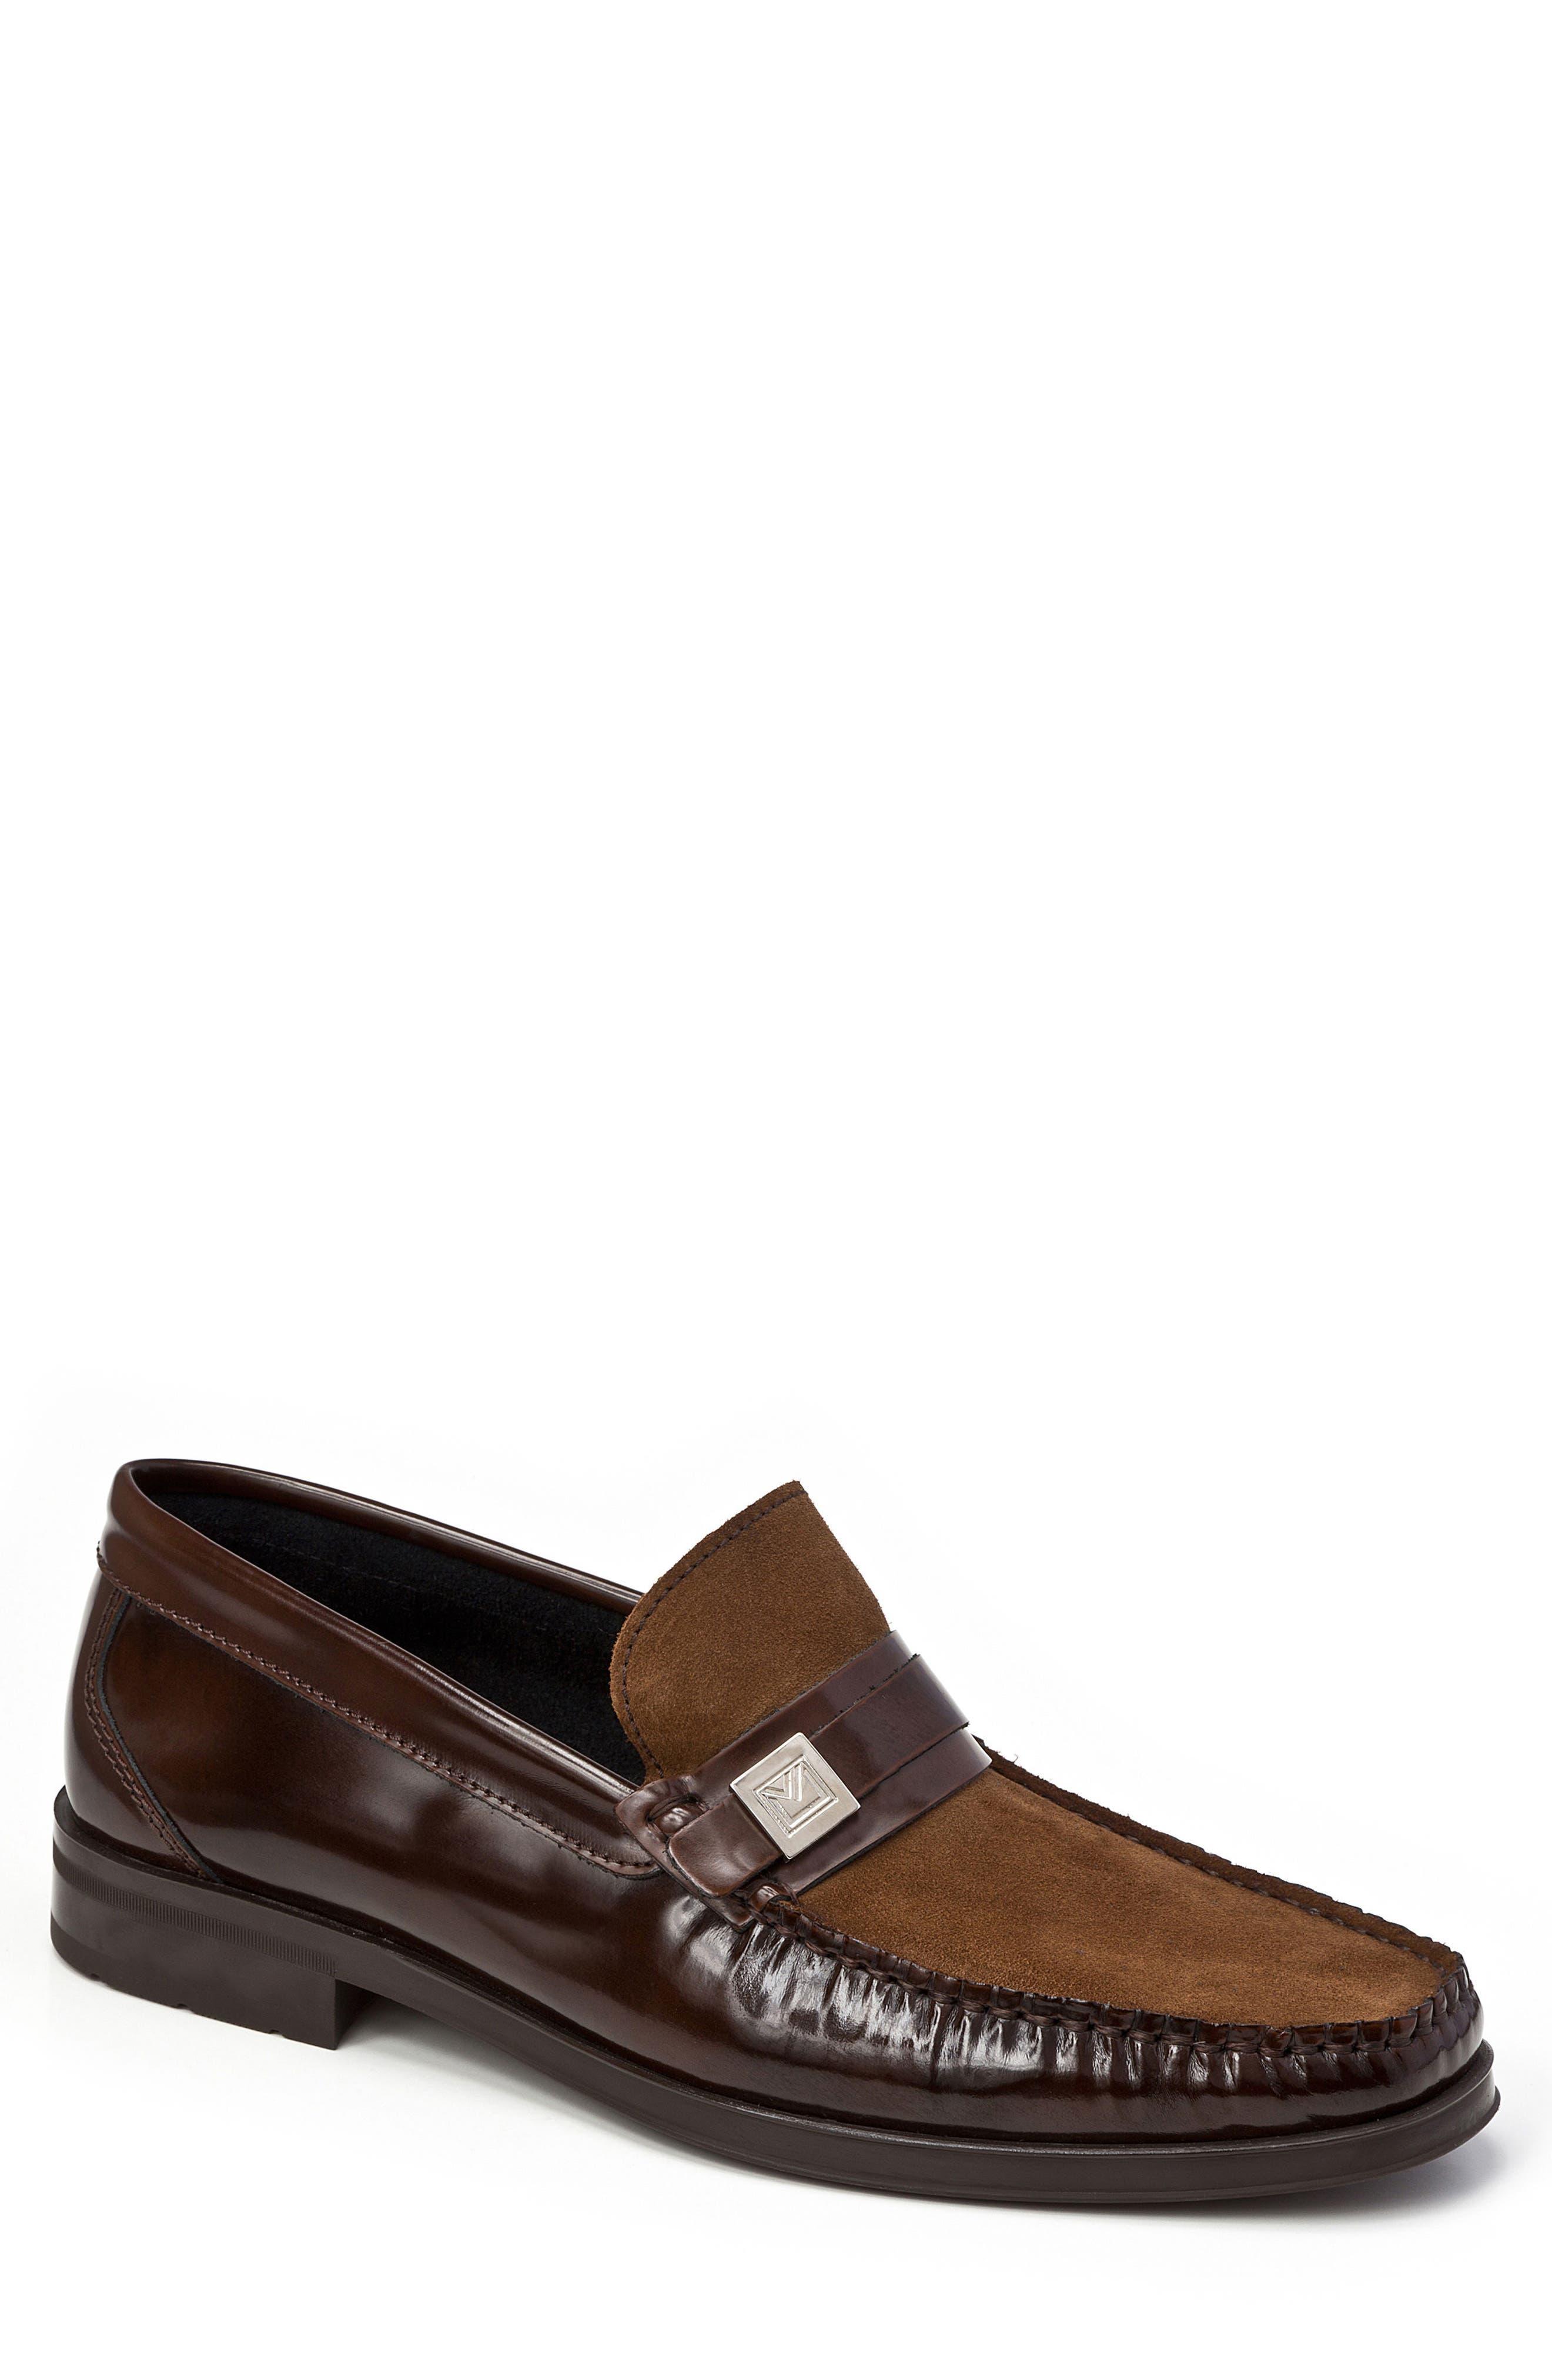 Avila Loafer,                         Main,                         color, Brown Leather